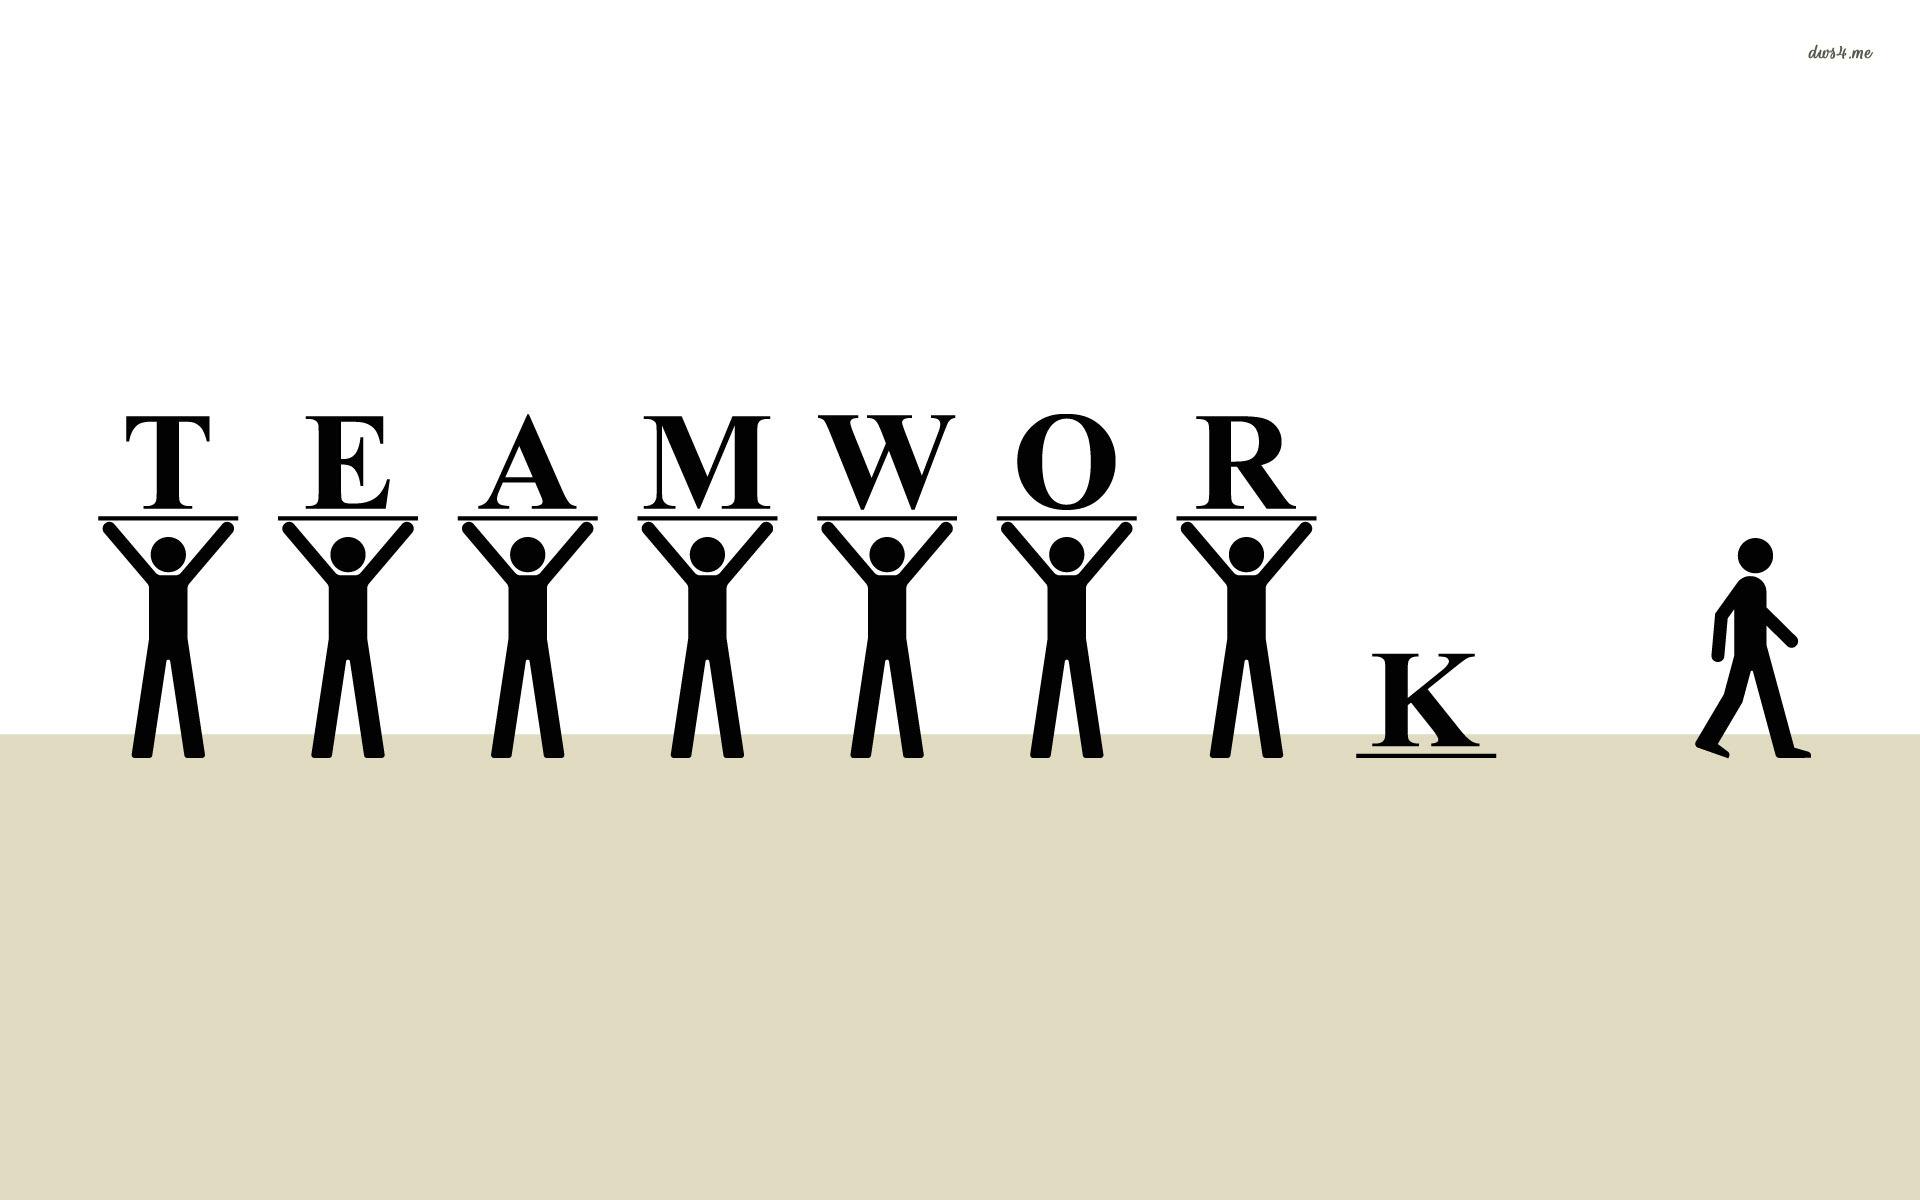 Teamwork Funny.